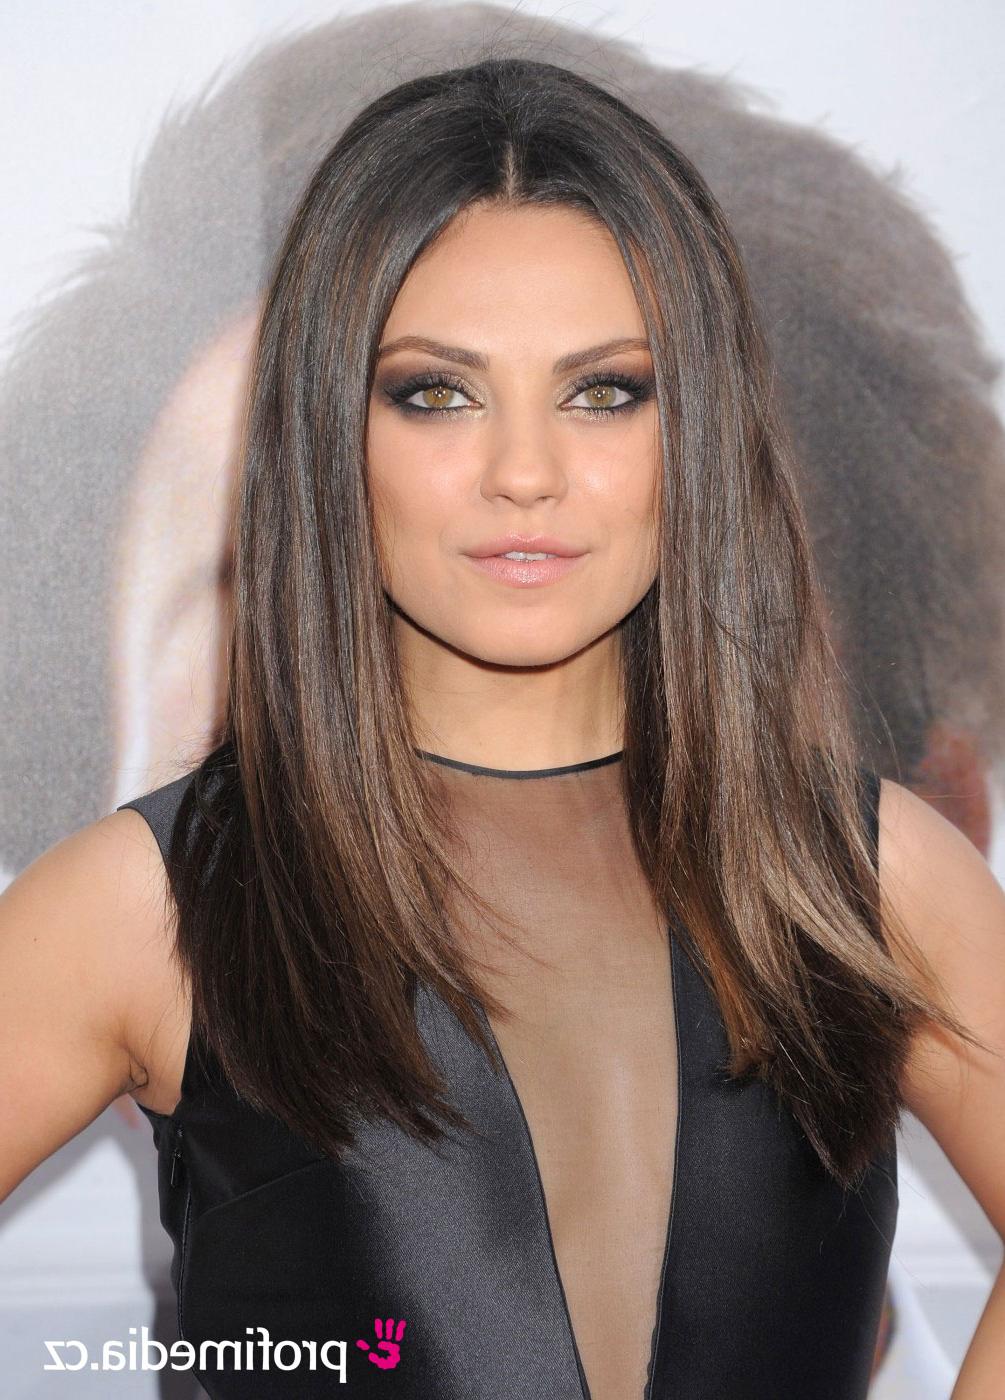 Mila Kunis – – Hairstyle – Easyhairstyler With Regard To Mila Kunis Short Hairstyles (View 19 of 25)